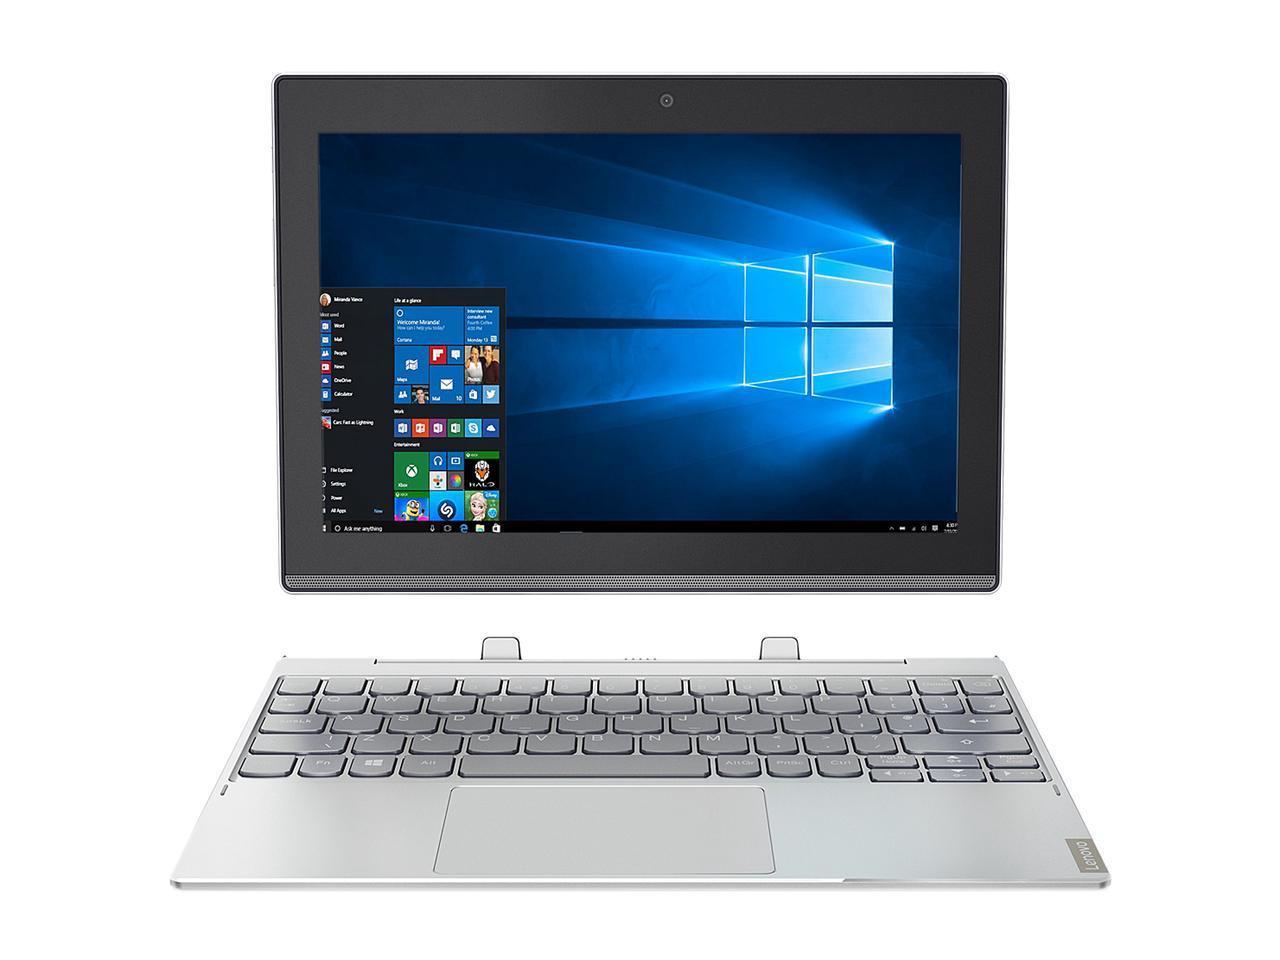 Lenovo Miix 320 2-in-1: Atom x5-Z8350, 4GB Ram, 64GB eMMC, 10.1'' FHD IPS Touch, Active Pen,Win10H @ $255.42 + F/S